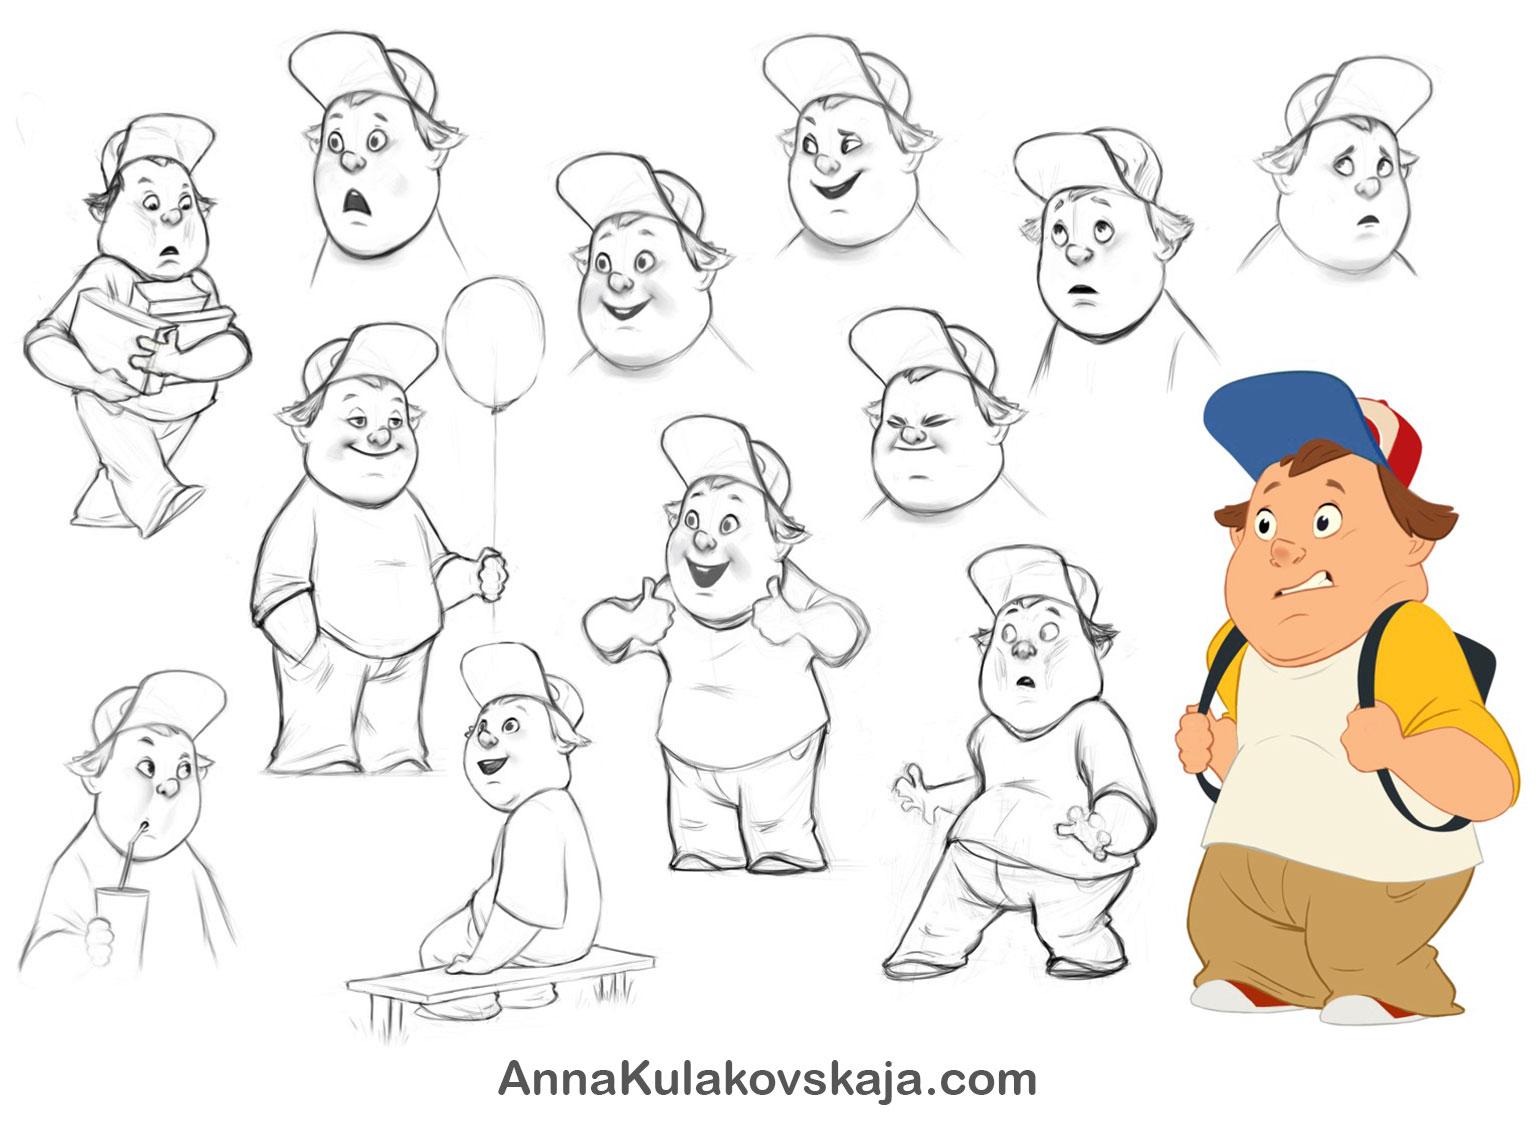 Anna-Kulakovskaja_Character-Designer_Hi-Res__.jpg